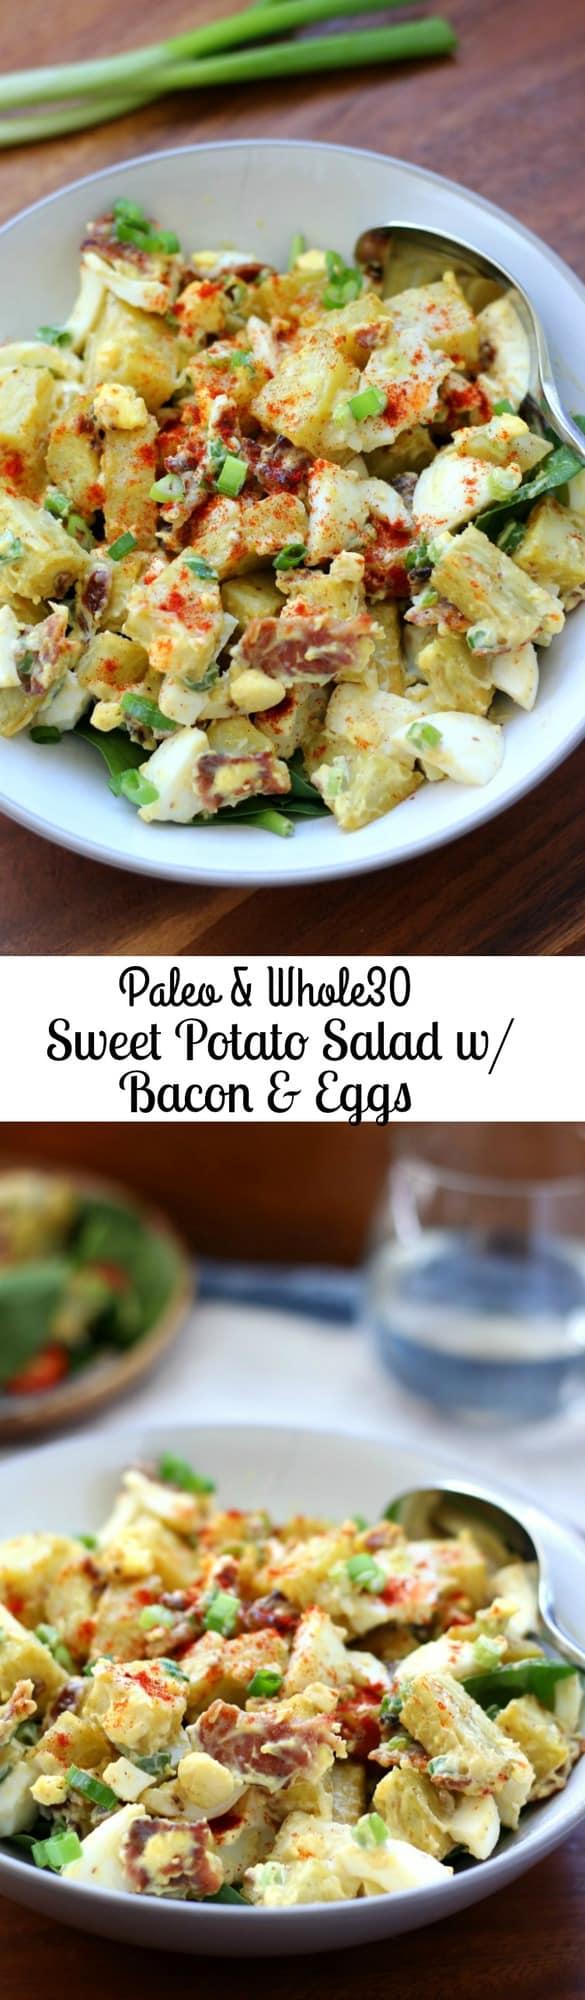 Paleo & Whole30 Sweet Potato Salad with Bacon, Eggs, Green onion and Paleo mayo. Japanese or white sweet potatoes preferable!